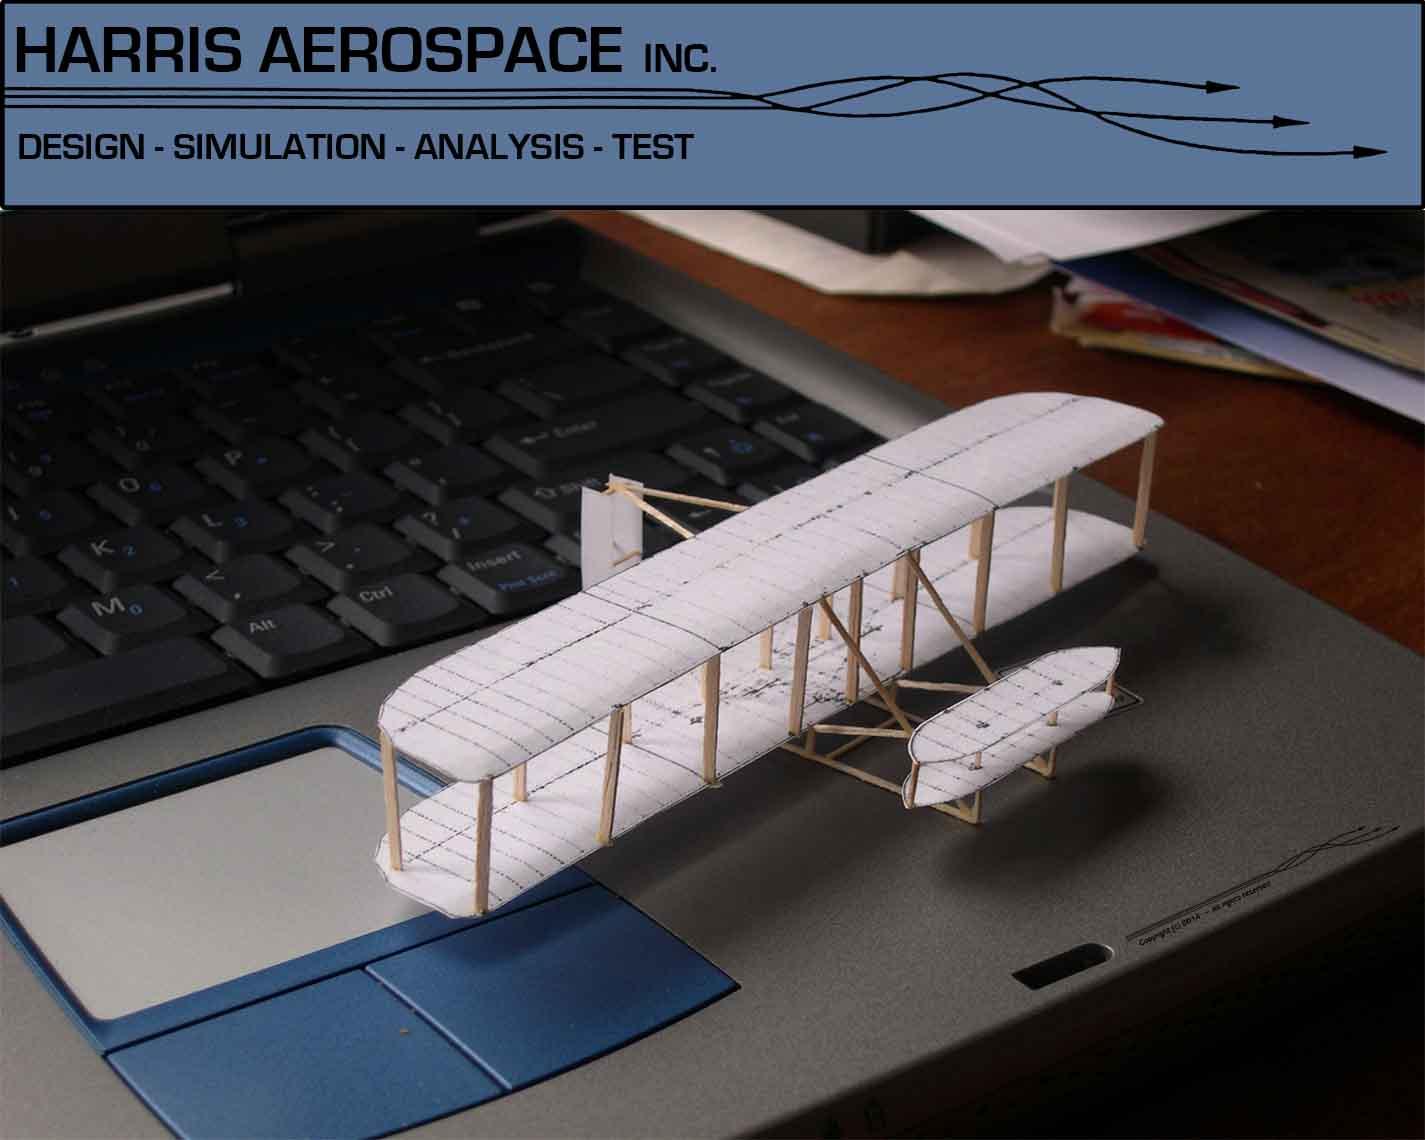 Harris Aerospace